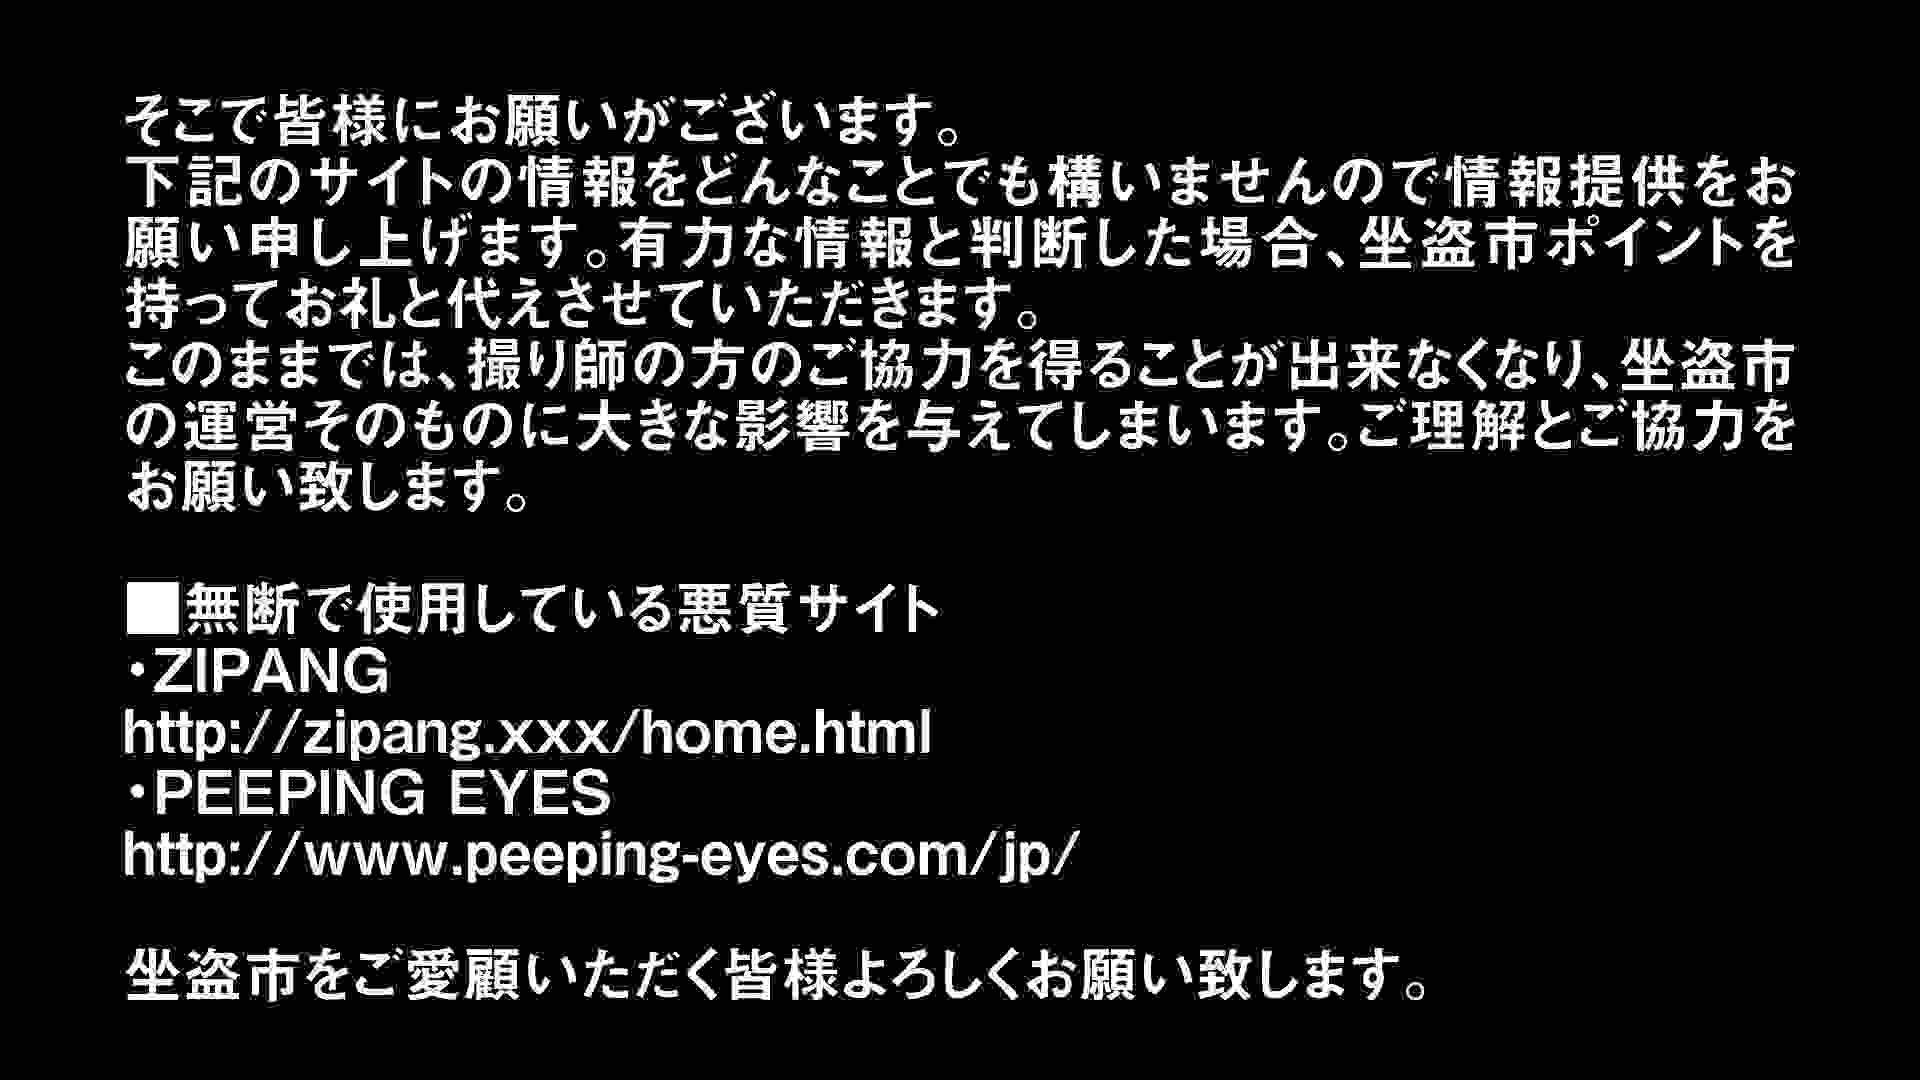 Aquaな露天風呂Vol.304 露天風呂編 | 盗撮シリーズ  85PIX 1